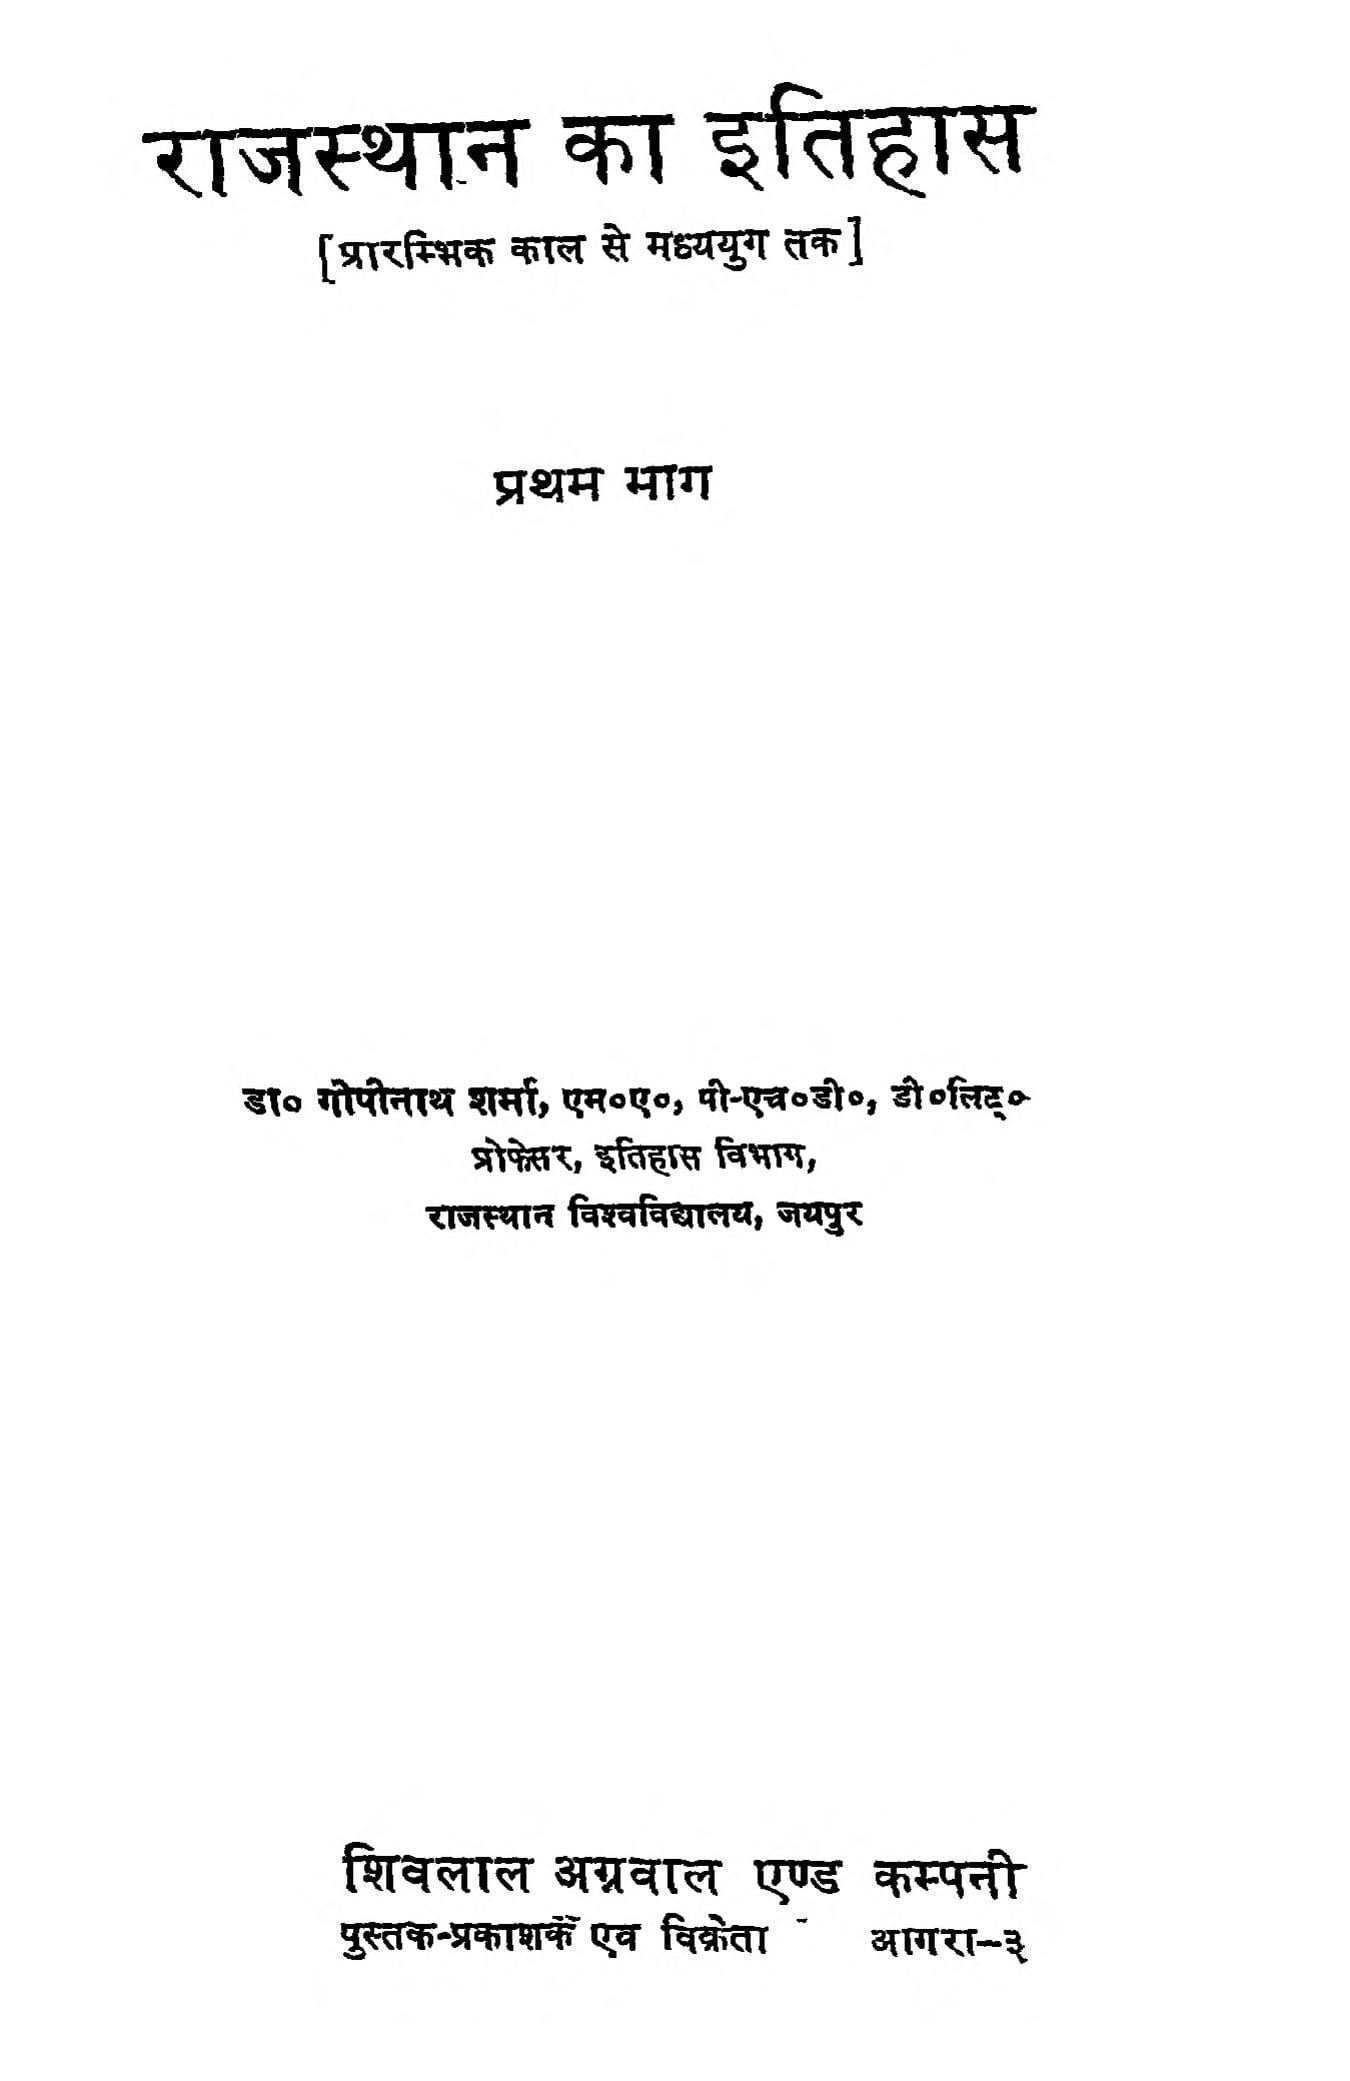 Rajasthan Ka Itihas  Part- I by डॉ. गोपीनाथ शर्मा - Dr. Gopinath Sharma